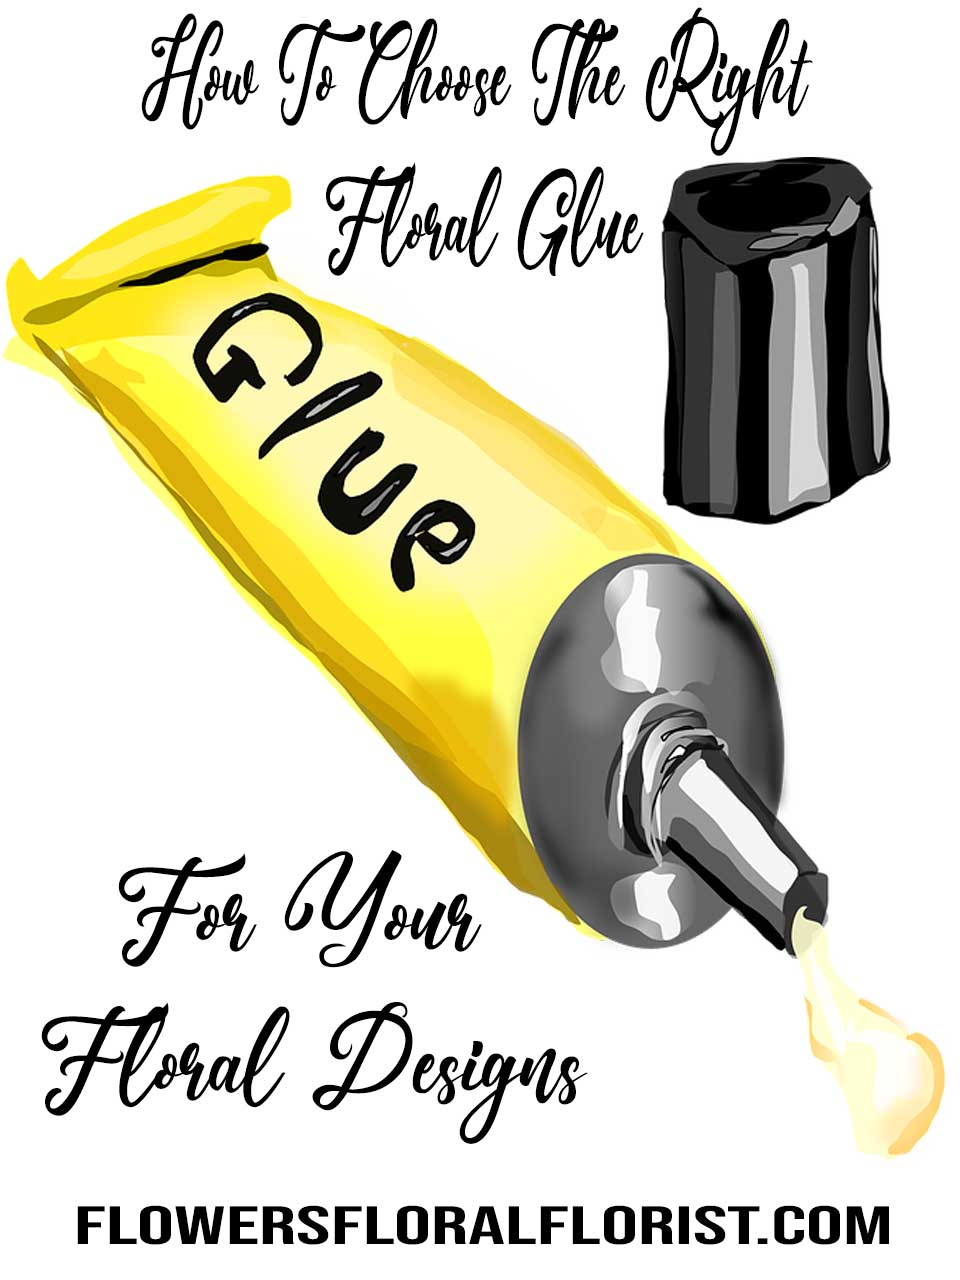 floral glue